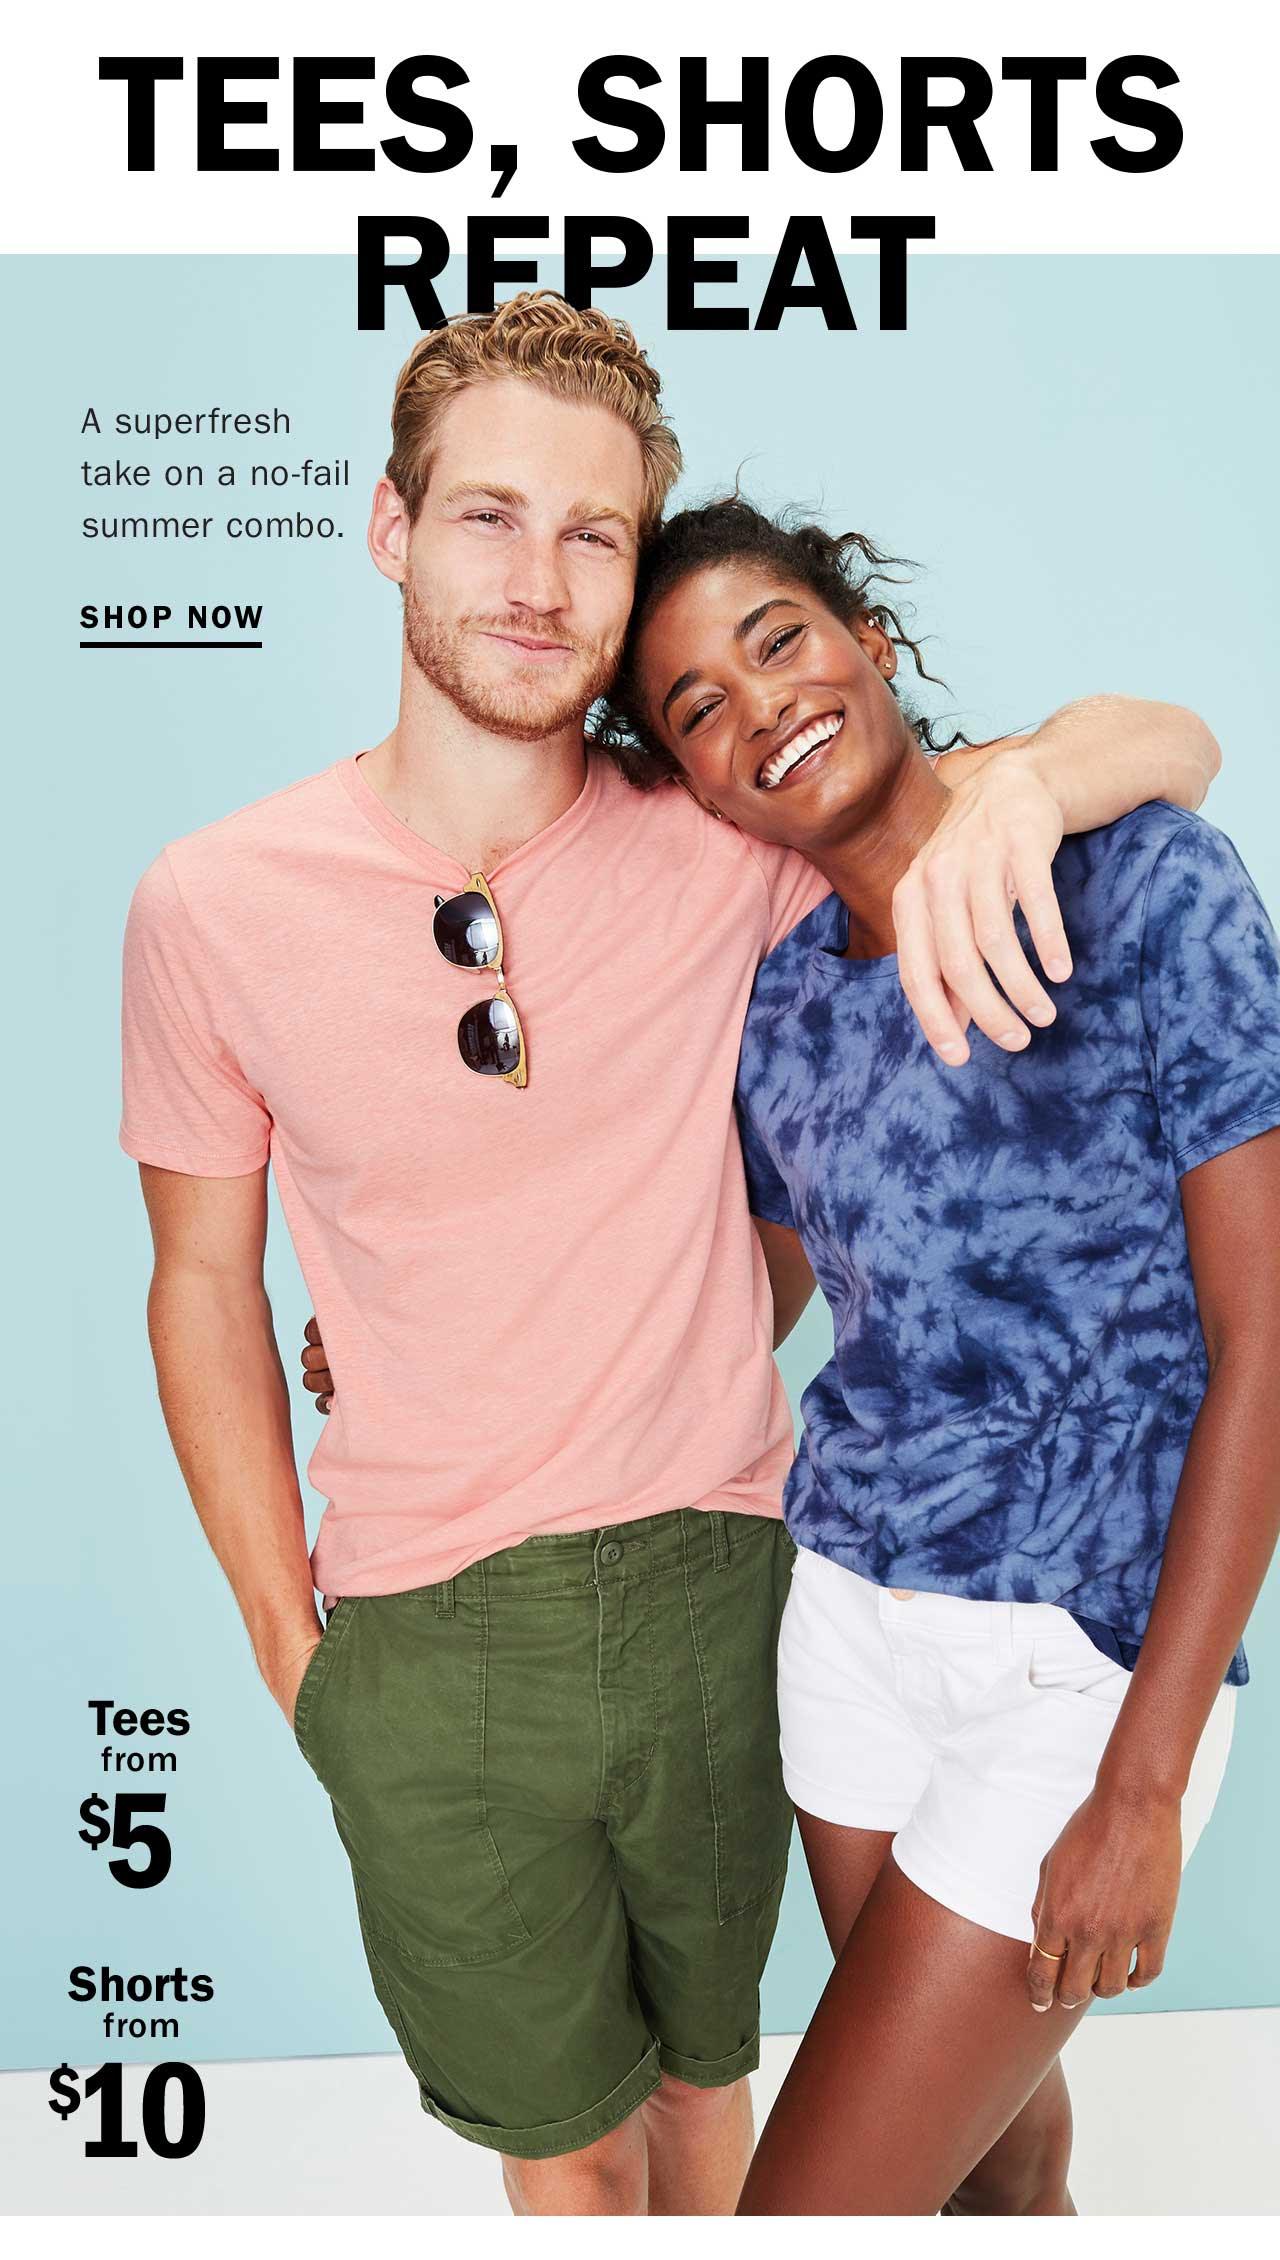 TEES, SHORTS REPEAT | Tees from $5 | Shorts from $10